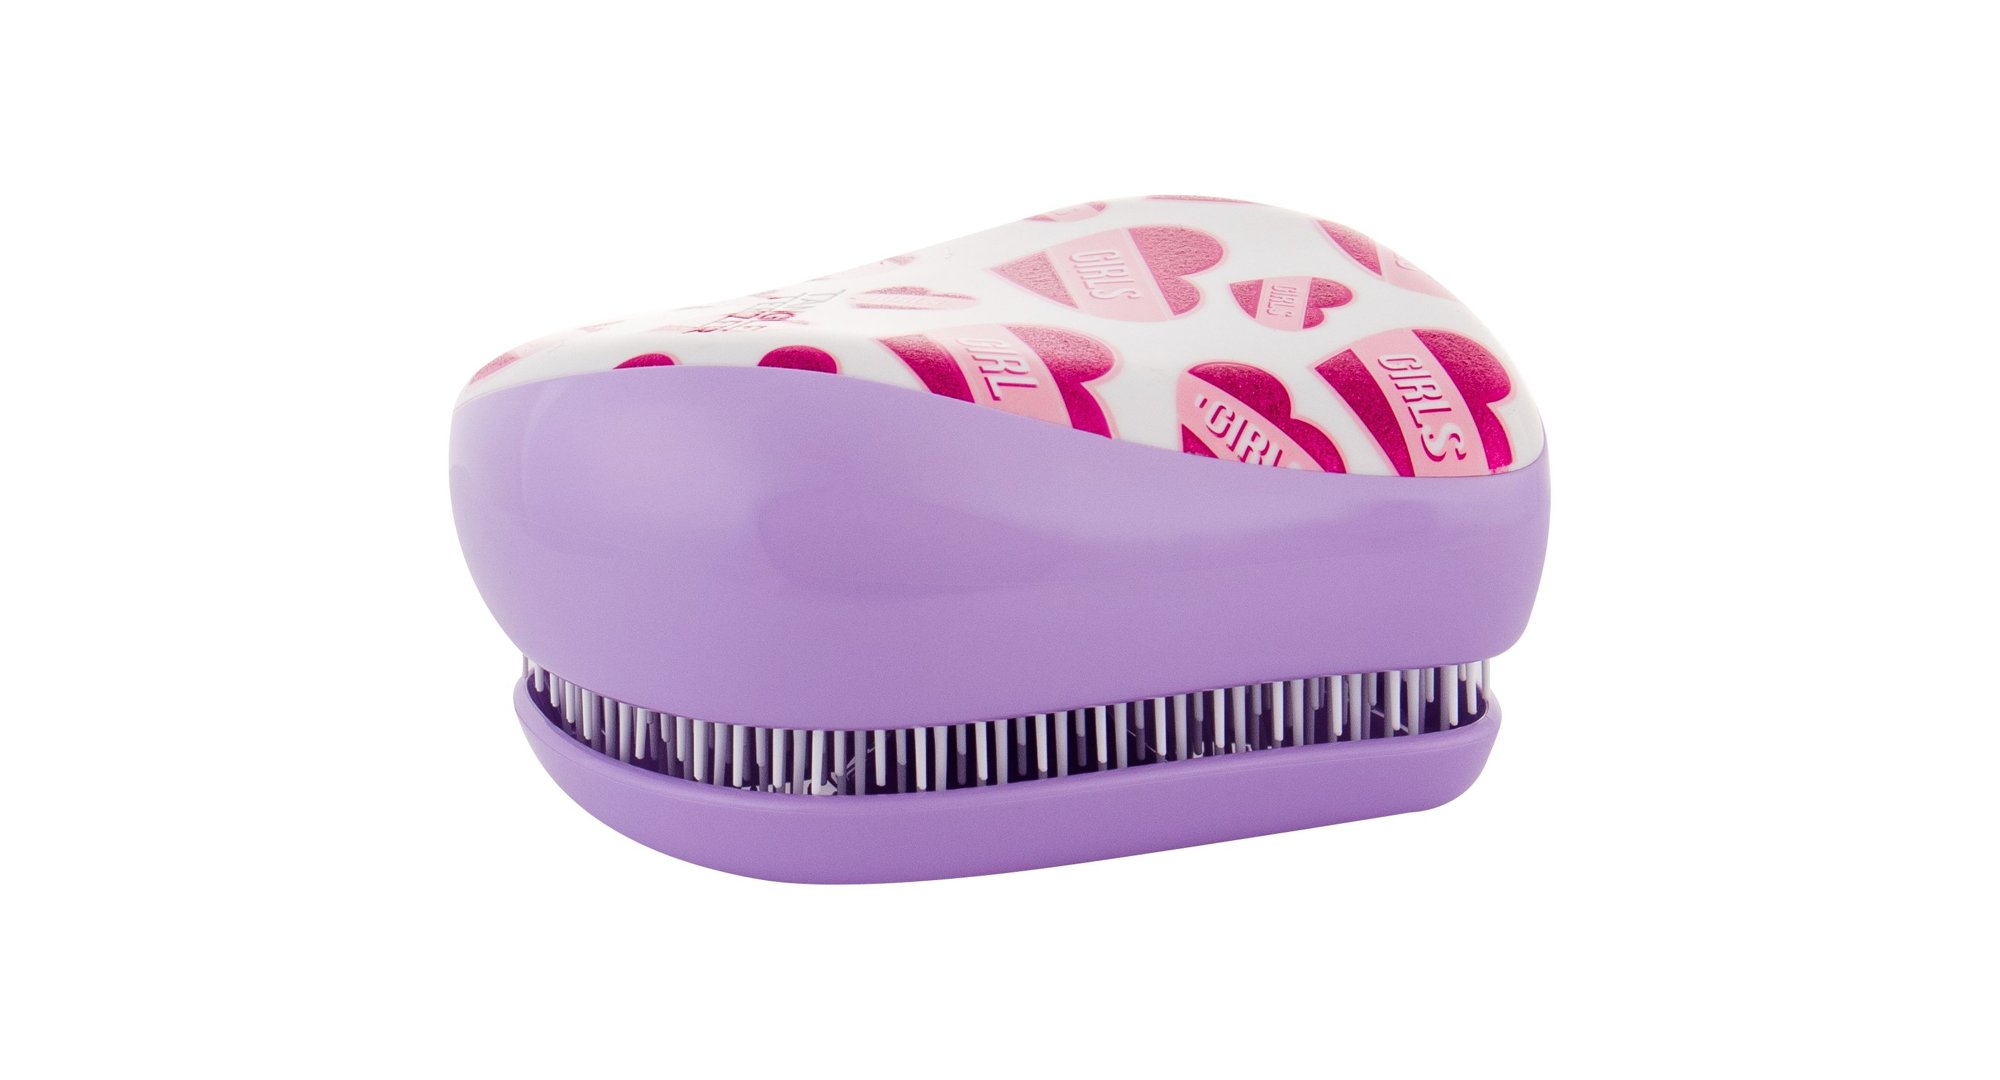 Tangle Teezer Compact Styler Hairbrush 1ml Girl Power